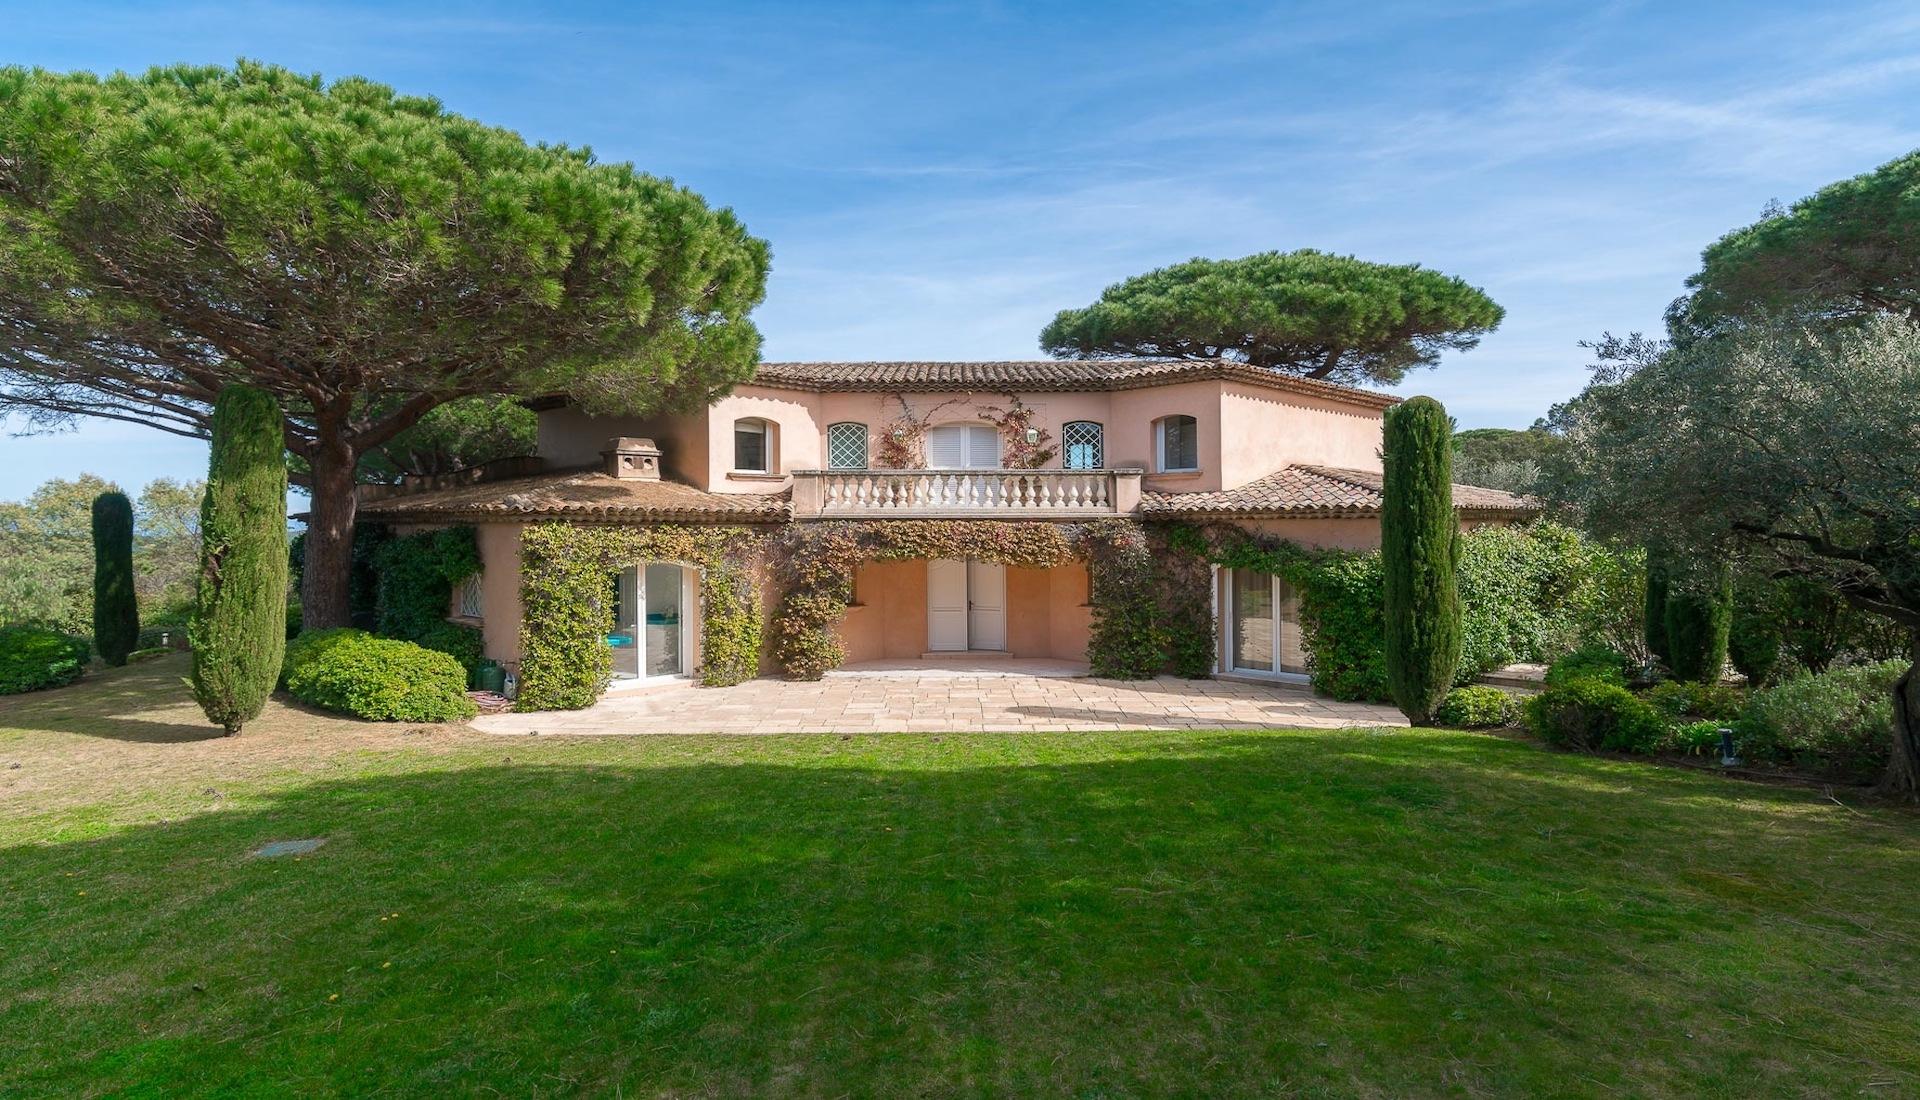 Villa grenouille BD Tardieu-Bo House-1 - copie